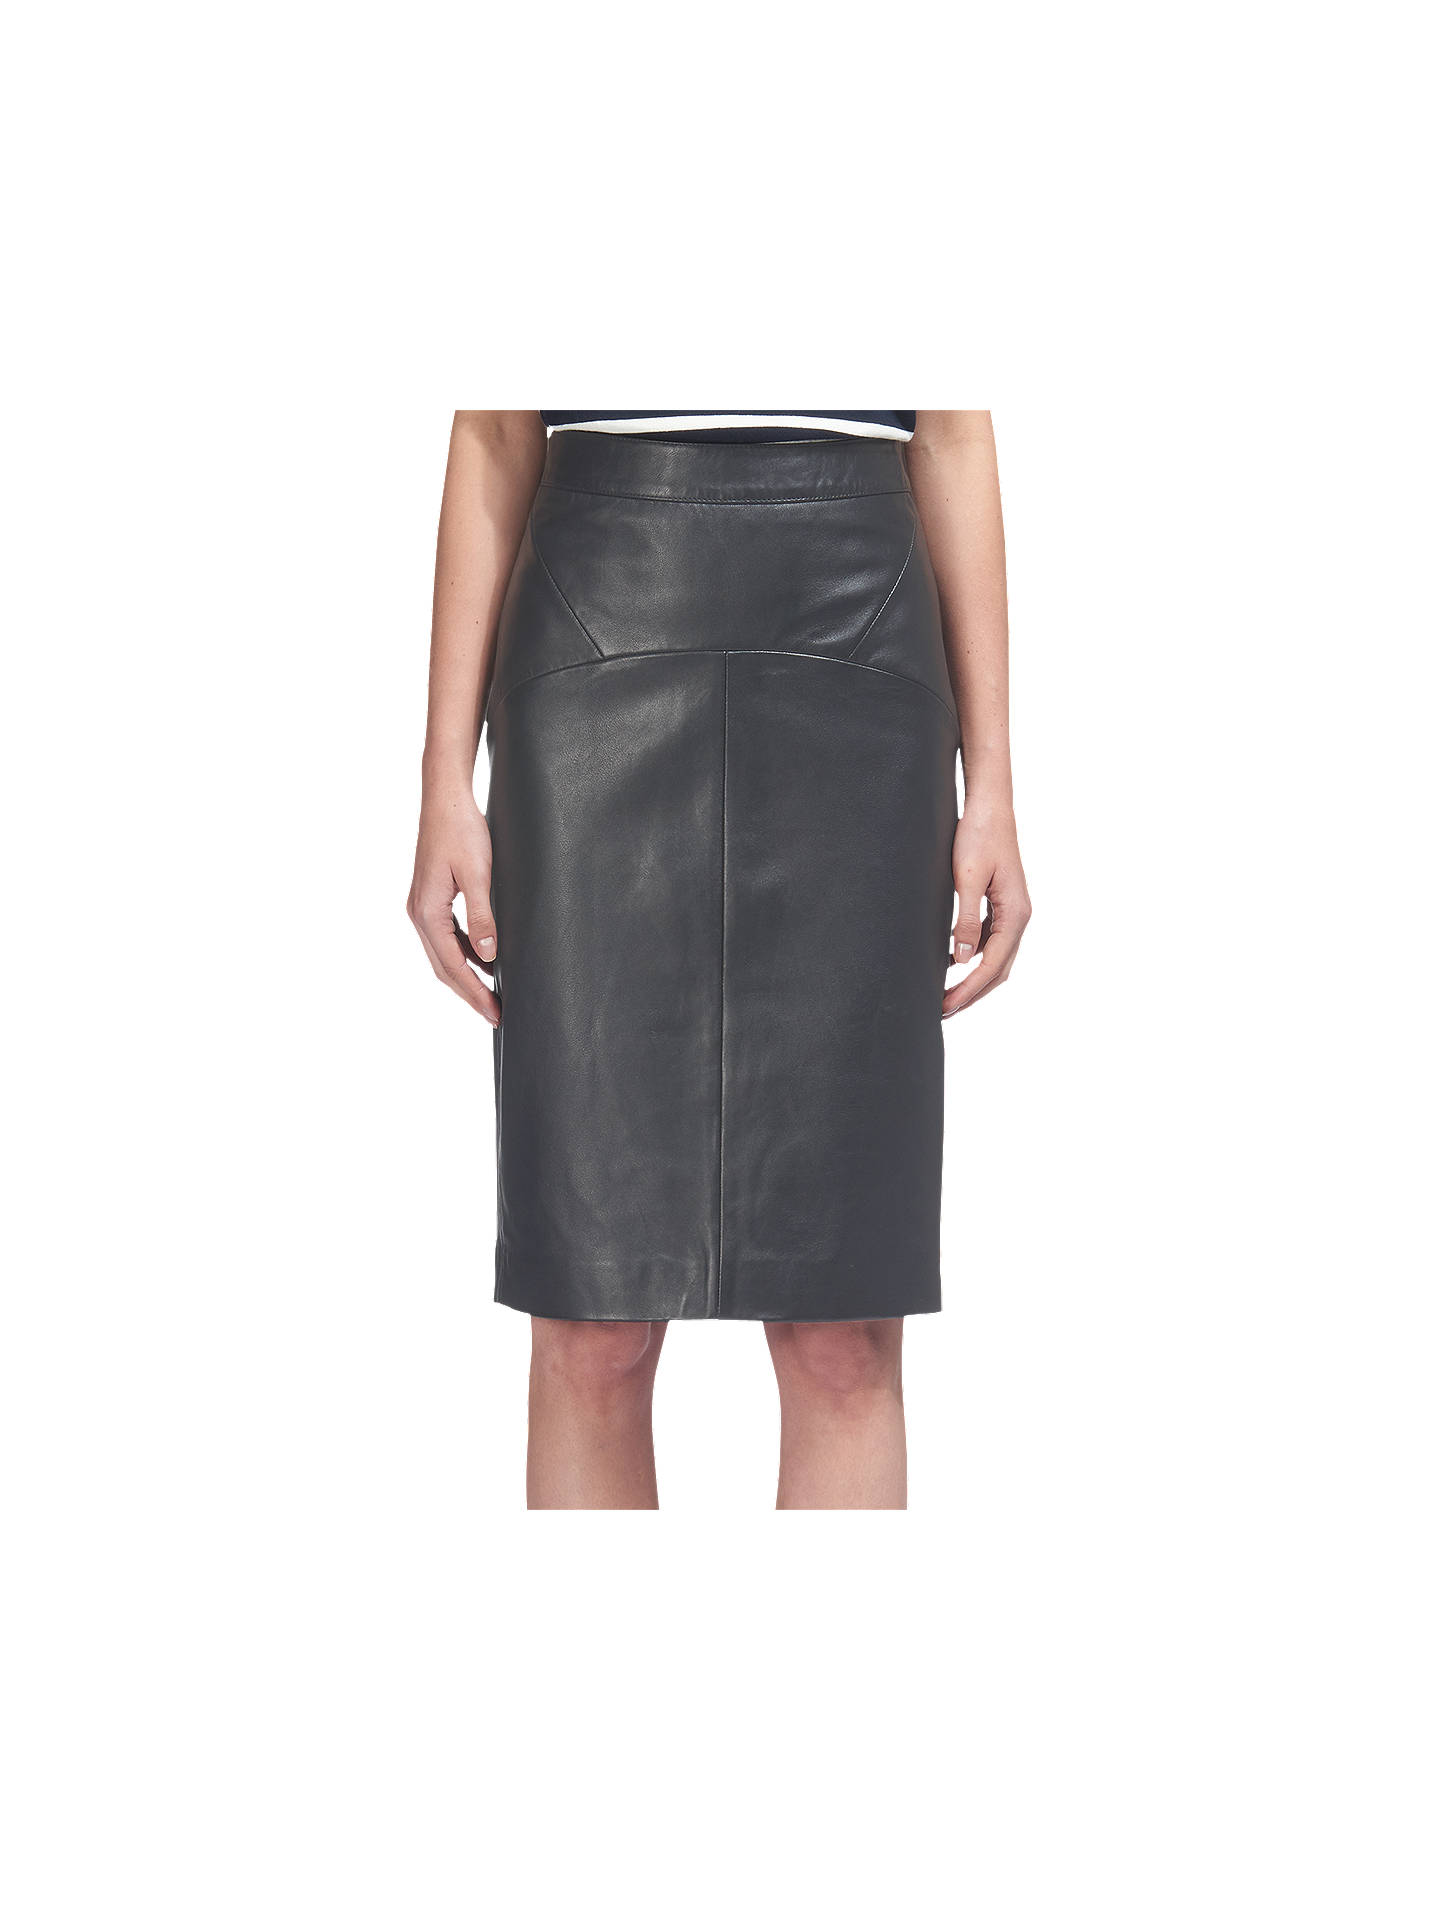 54fc34ef5869 Buy Whistles Kel Leather Pencil Skirt